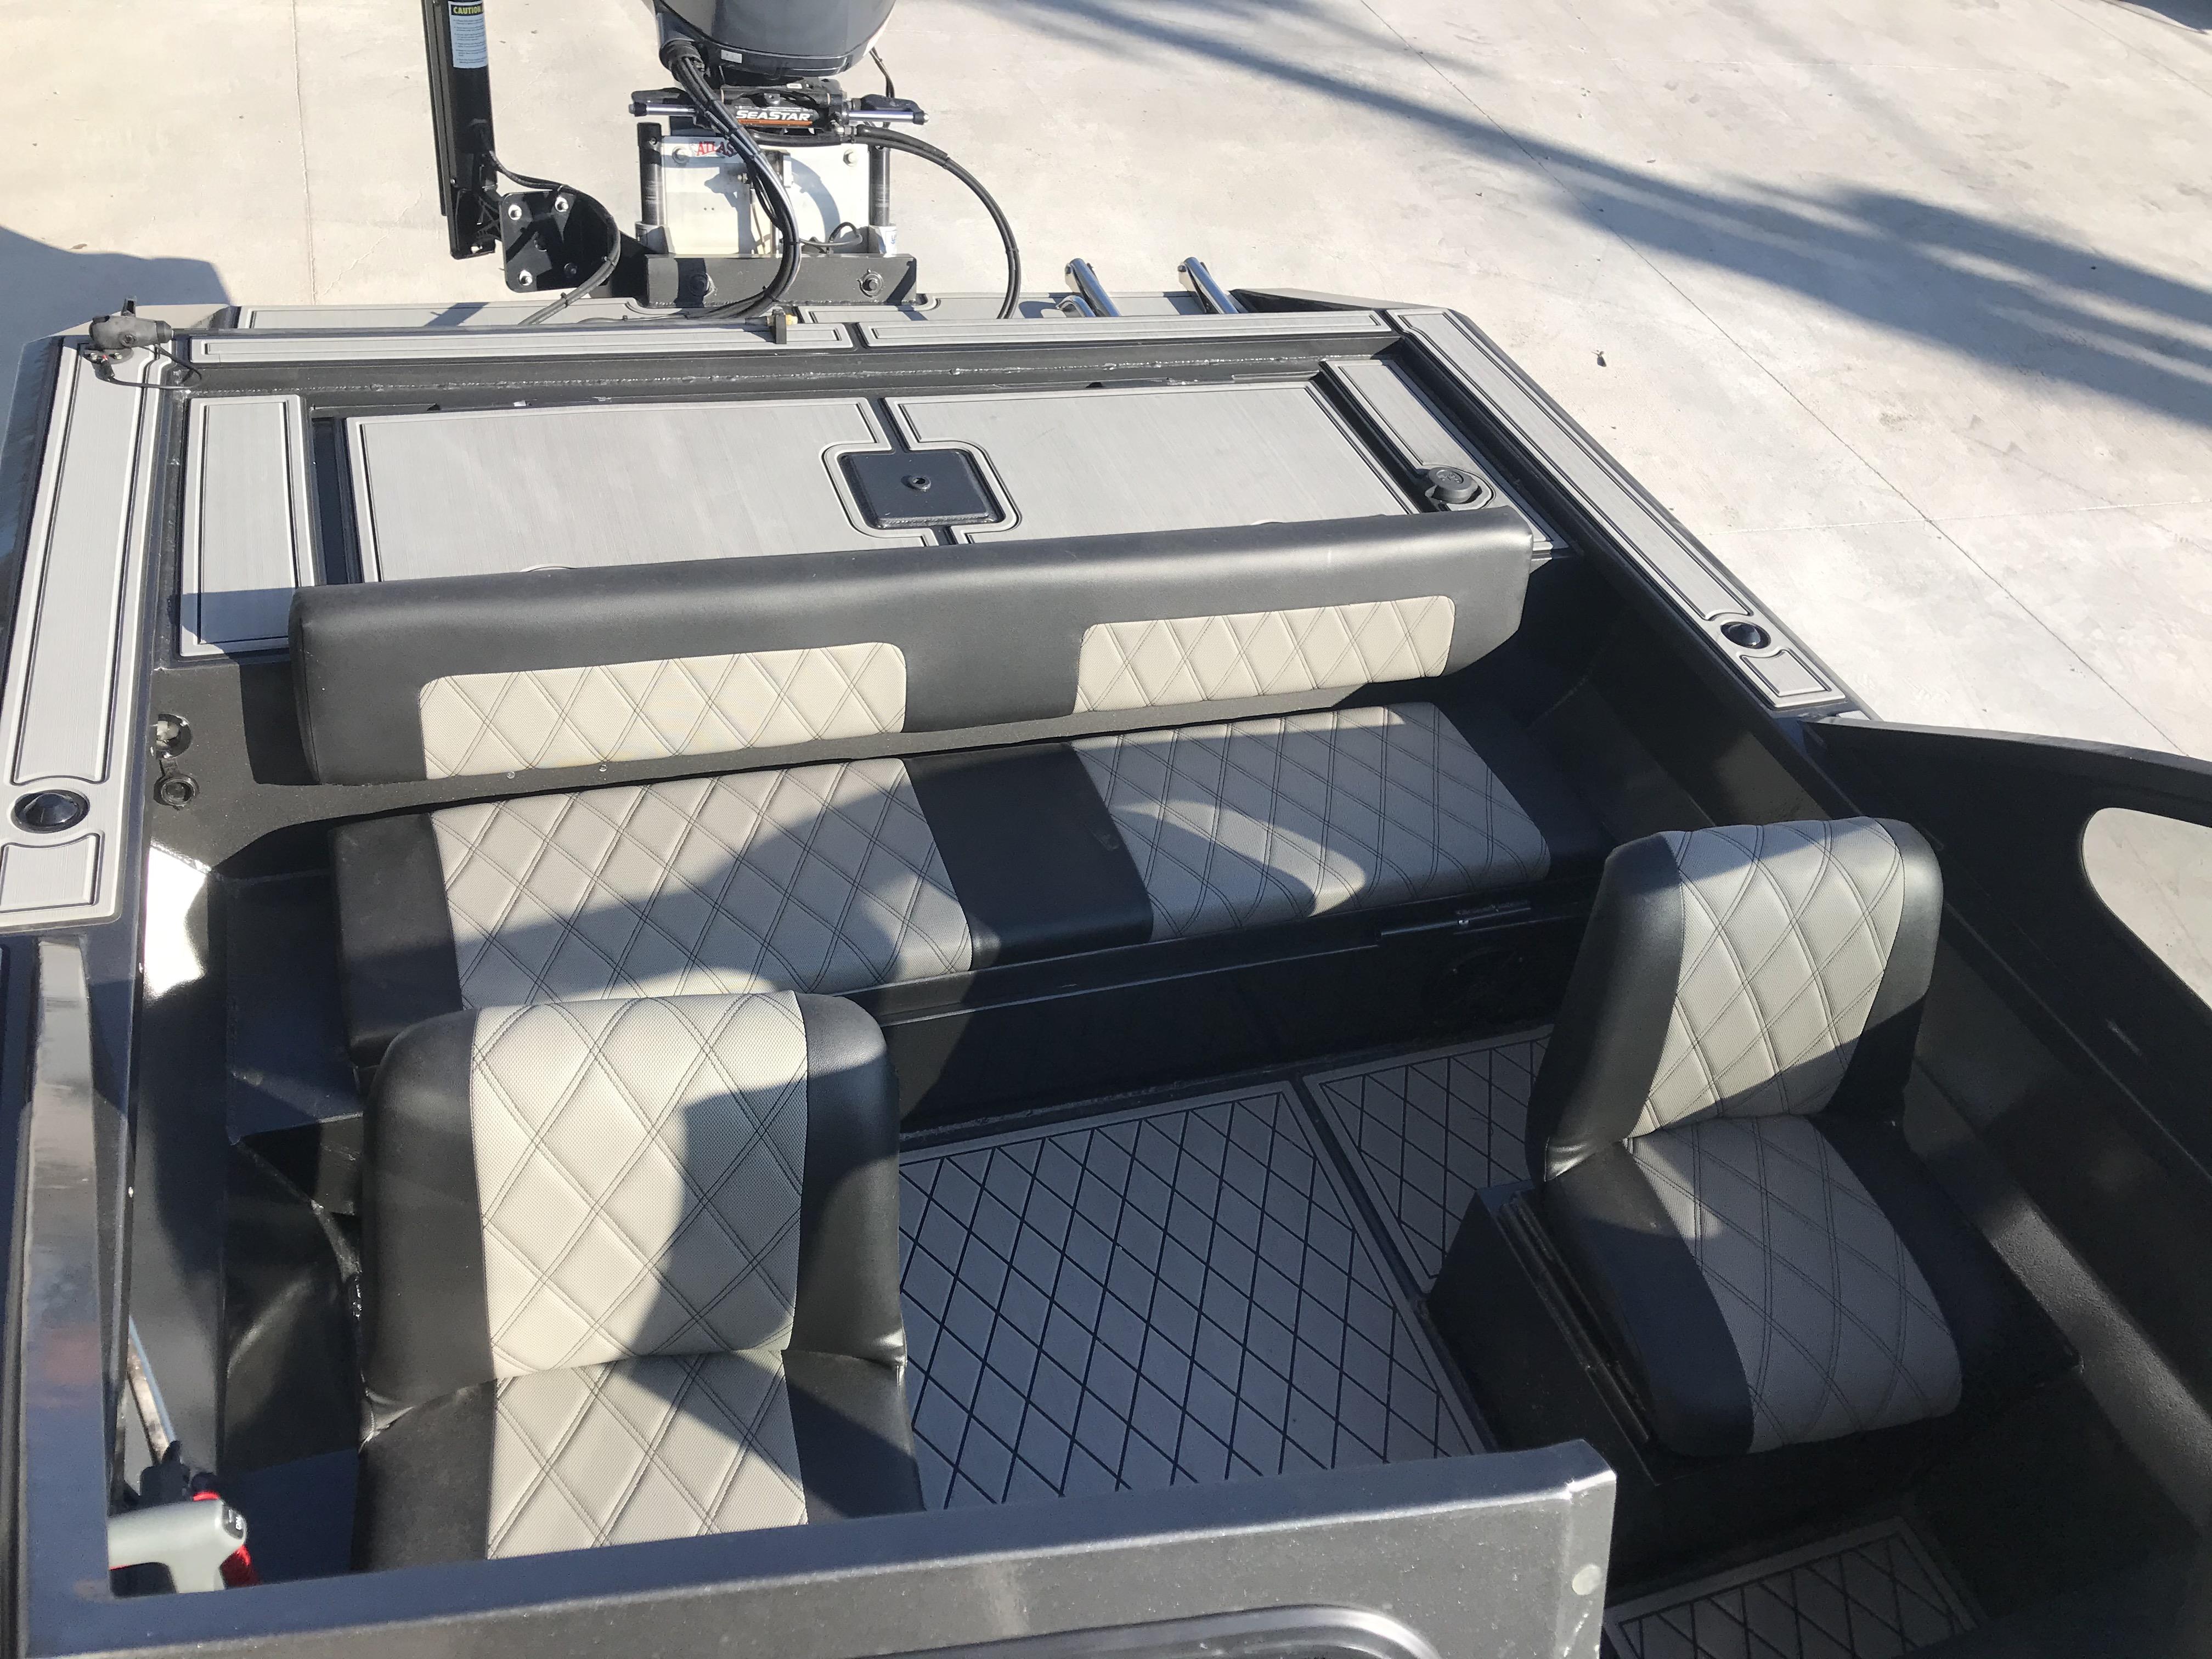 2019 Custom boat for sale, model of the boat is Custom 24ft. & Image # 12 of 17